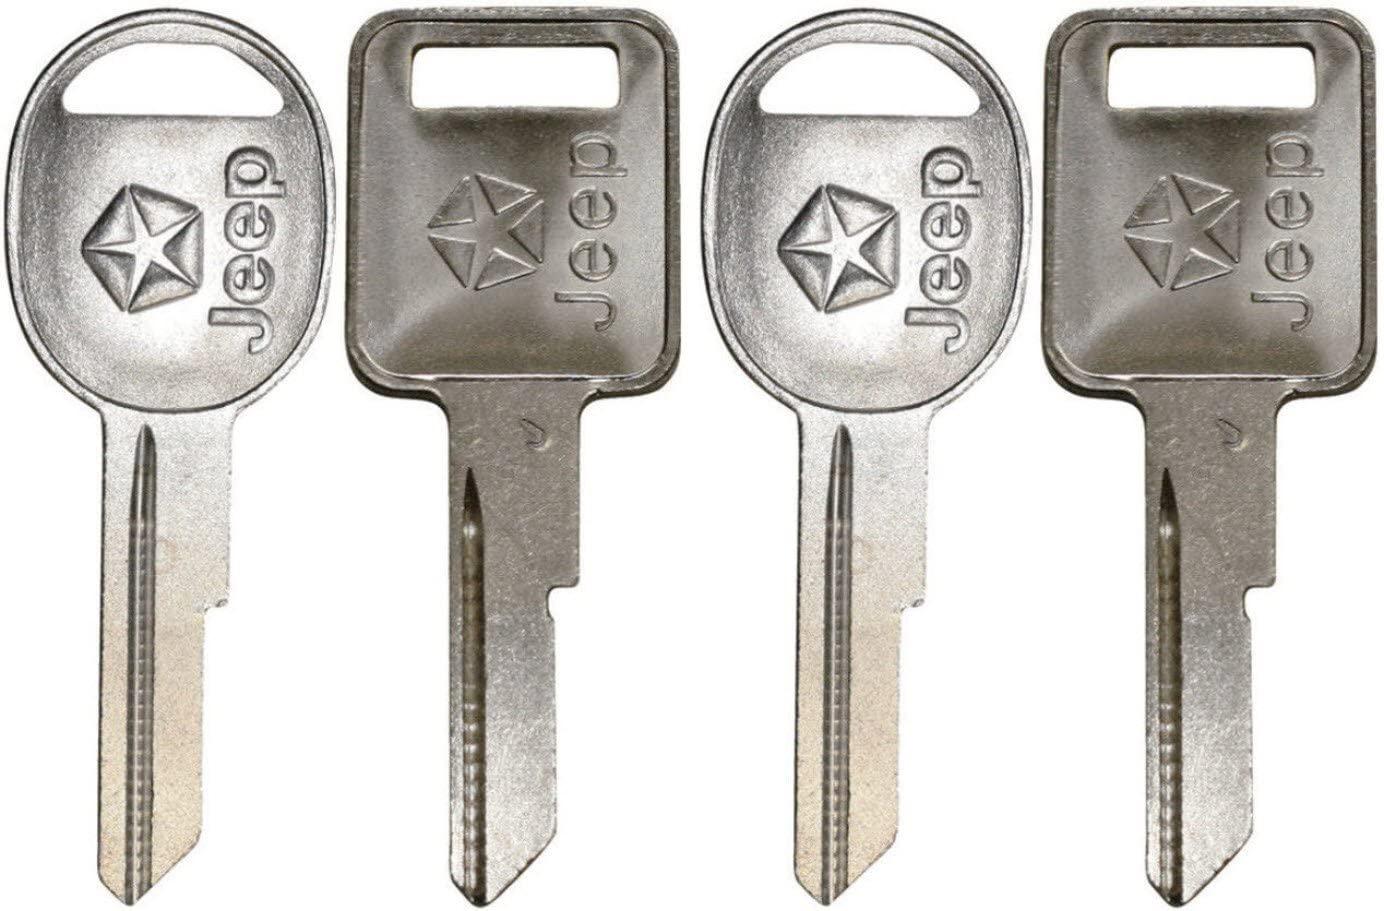 321815 X2 + 321816 X2, 4 NEW Jeep Logo OEM IGNITION + DOORS/TRUNK Key Blanks Uncut 321815 + 321816